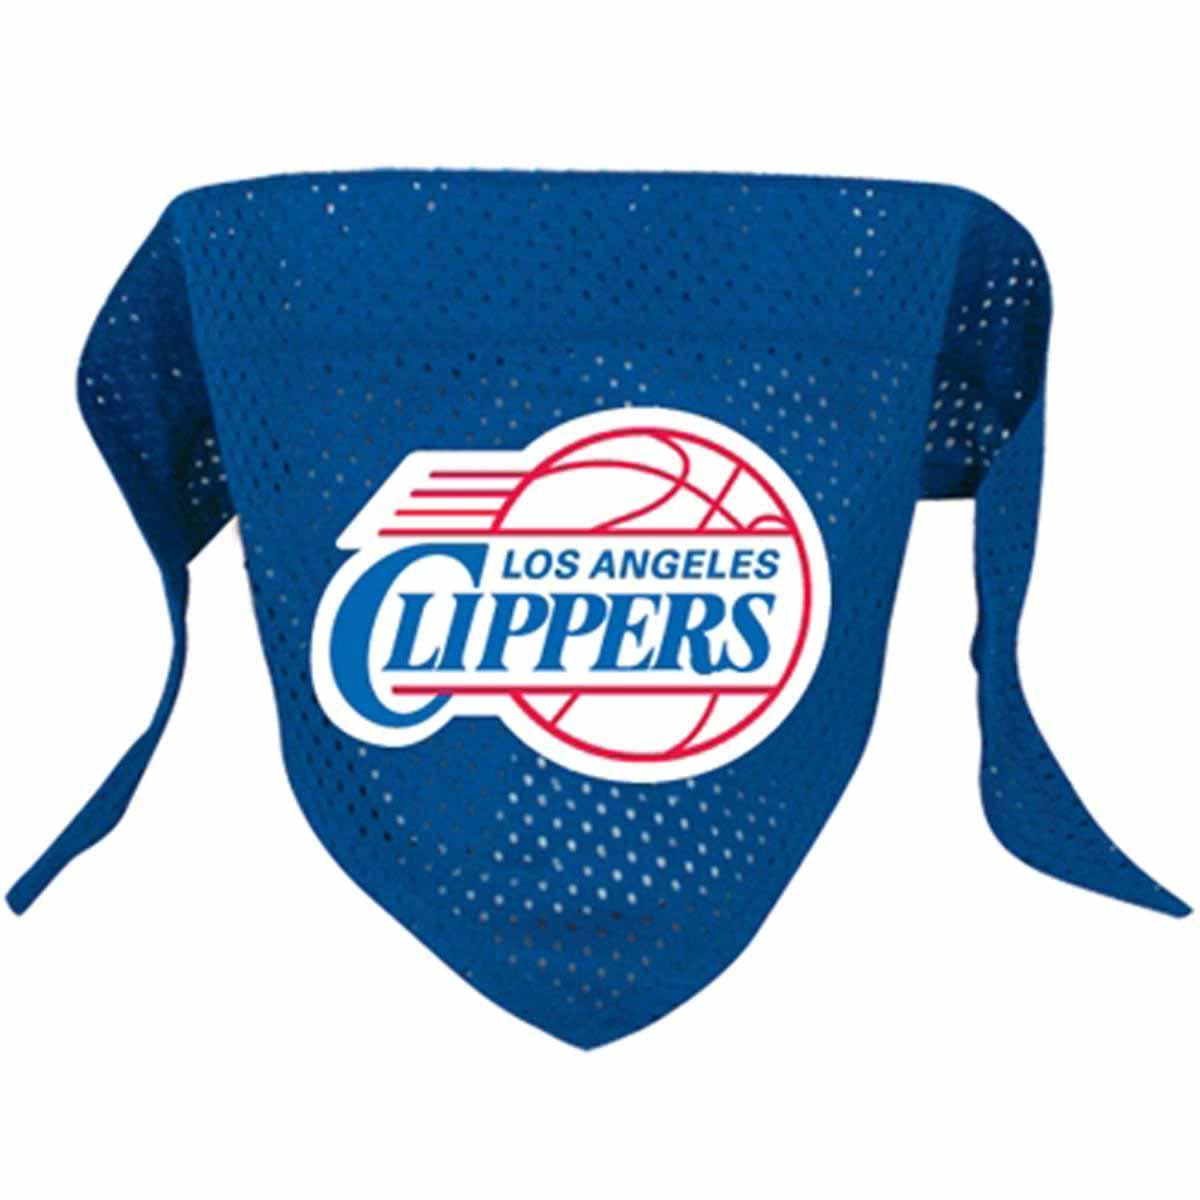 Los Angeles Clippers Mesh Dog Bandana